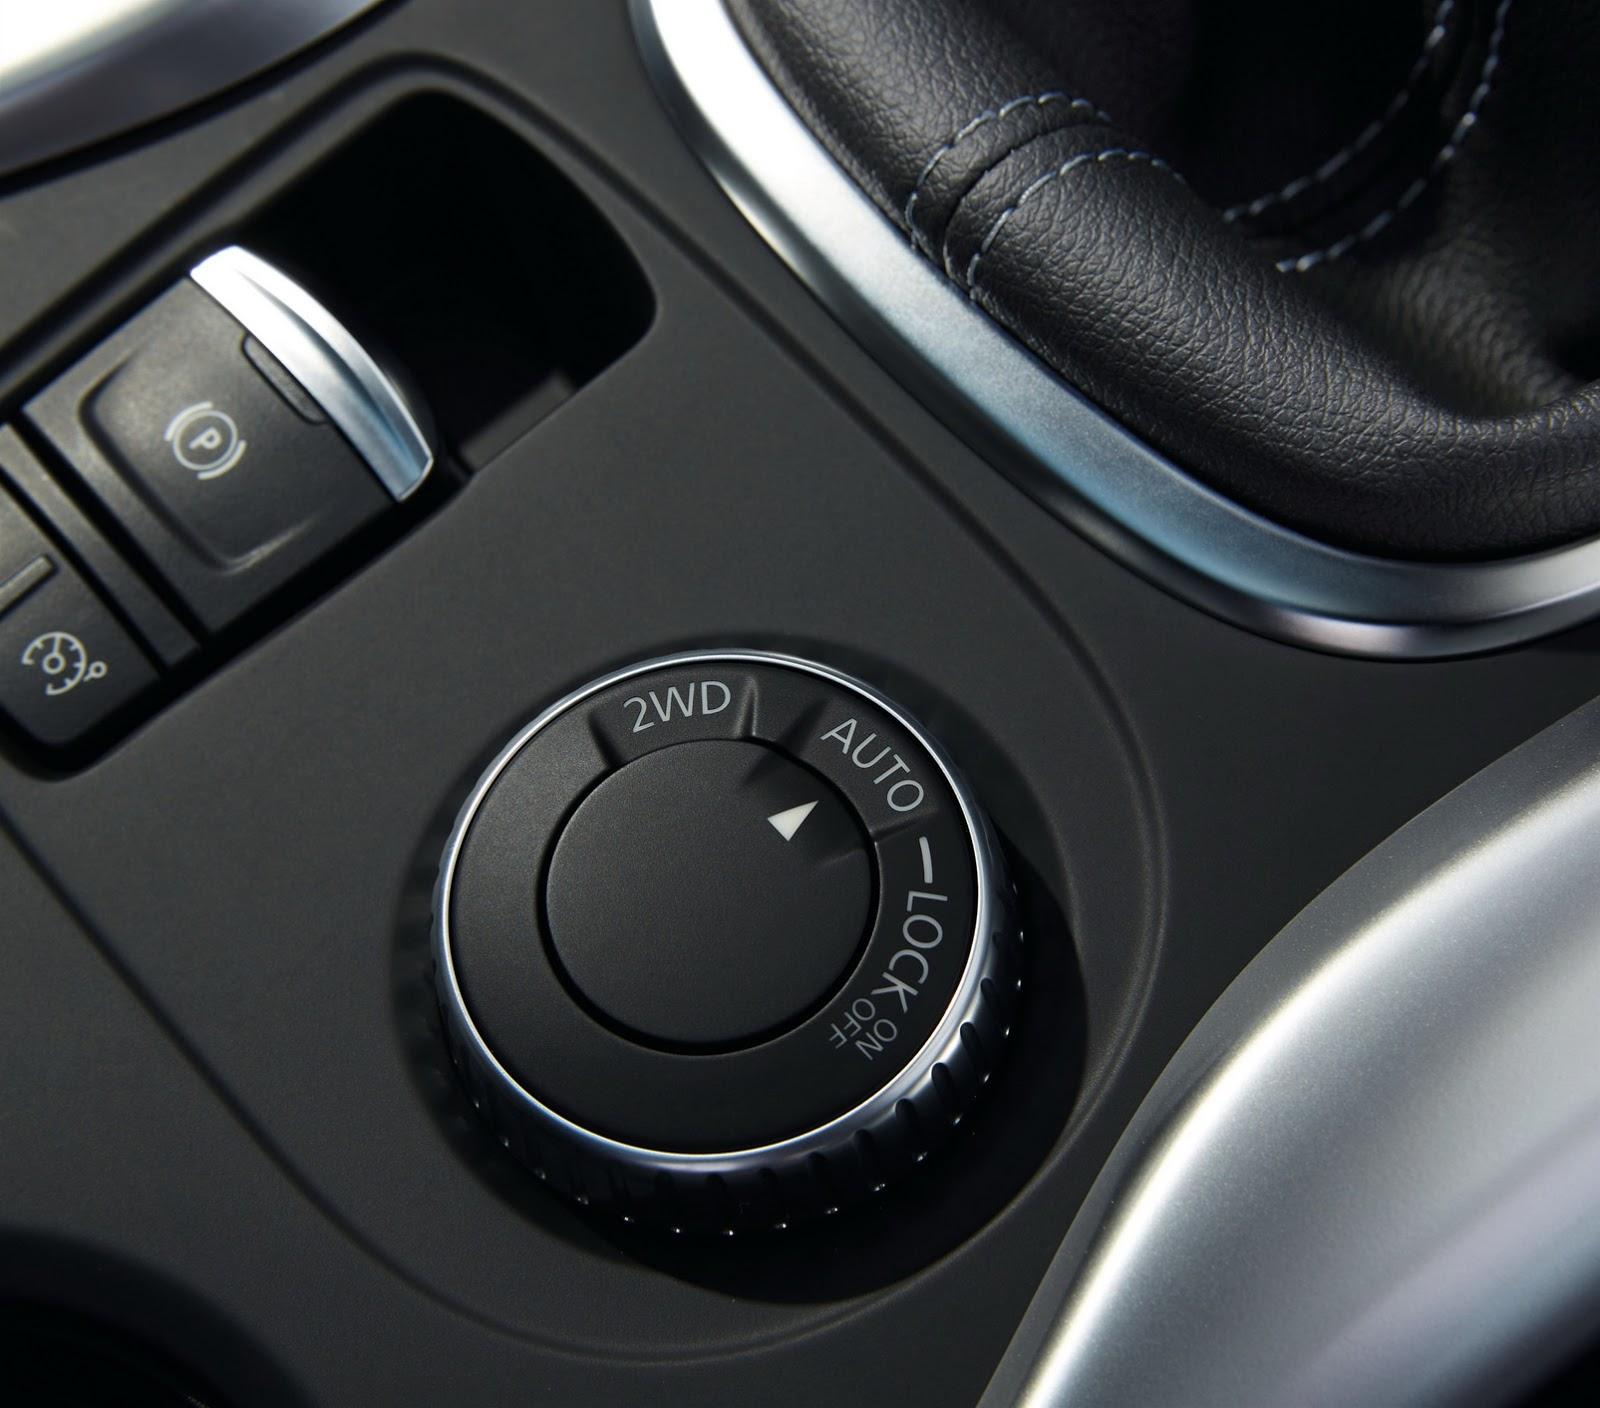 2018 Renault Kadjar Updated With Cvt Range Topping Tce